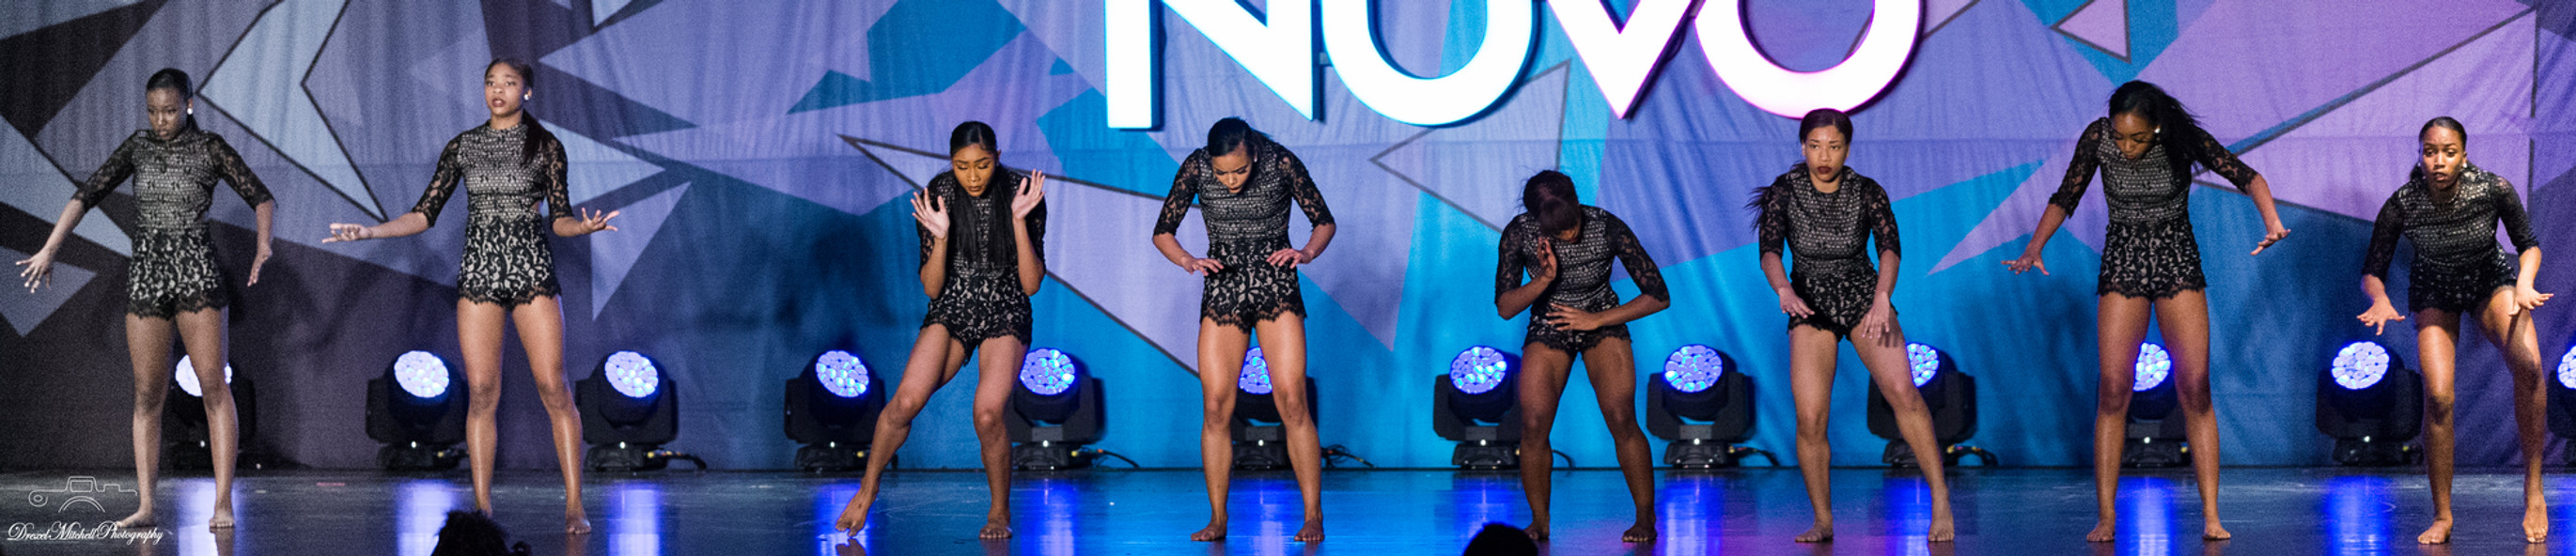 """Ex-Factor"" (2017) Choreography by Brooke Pierotti"